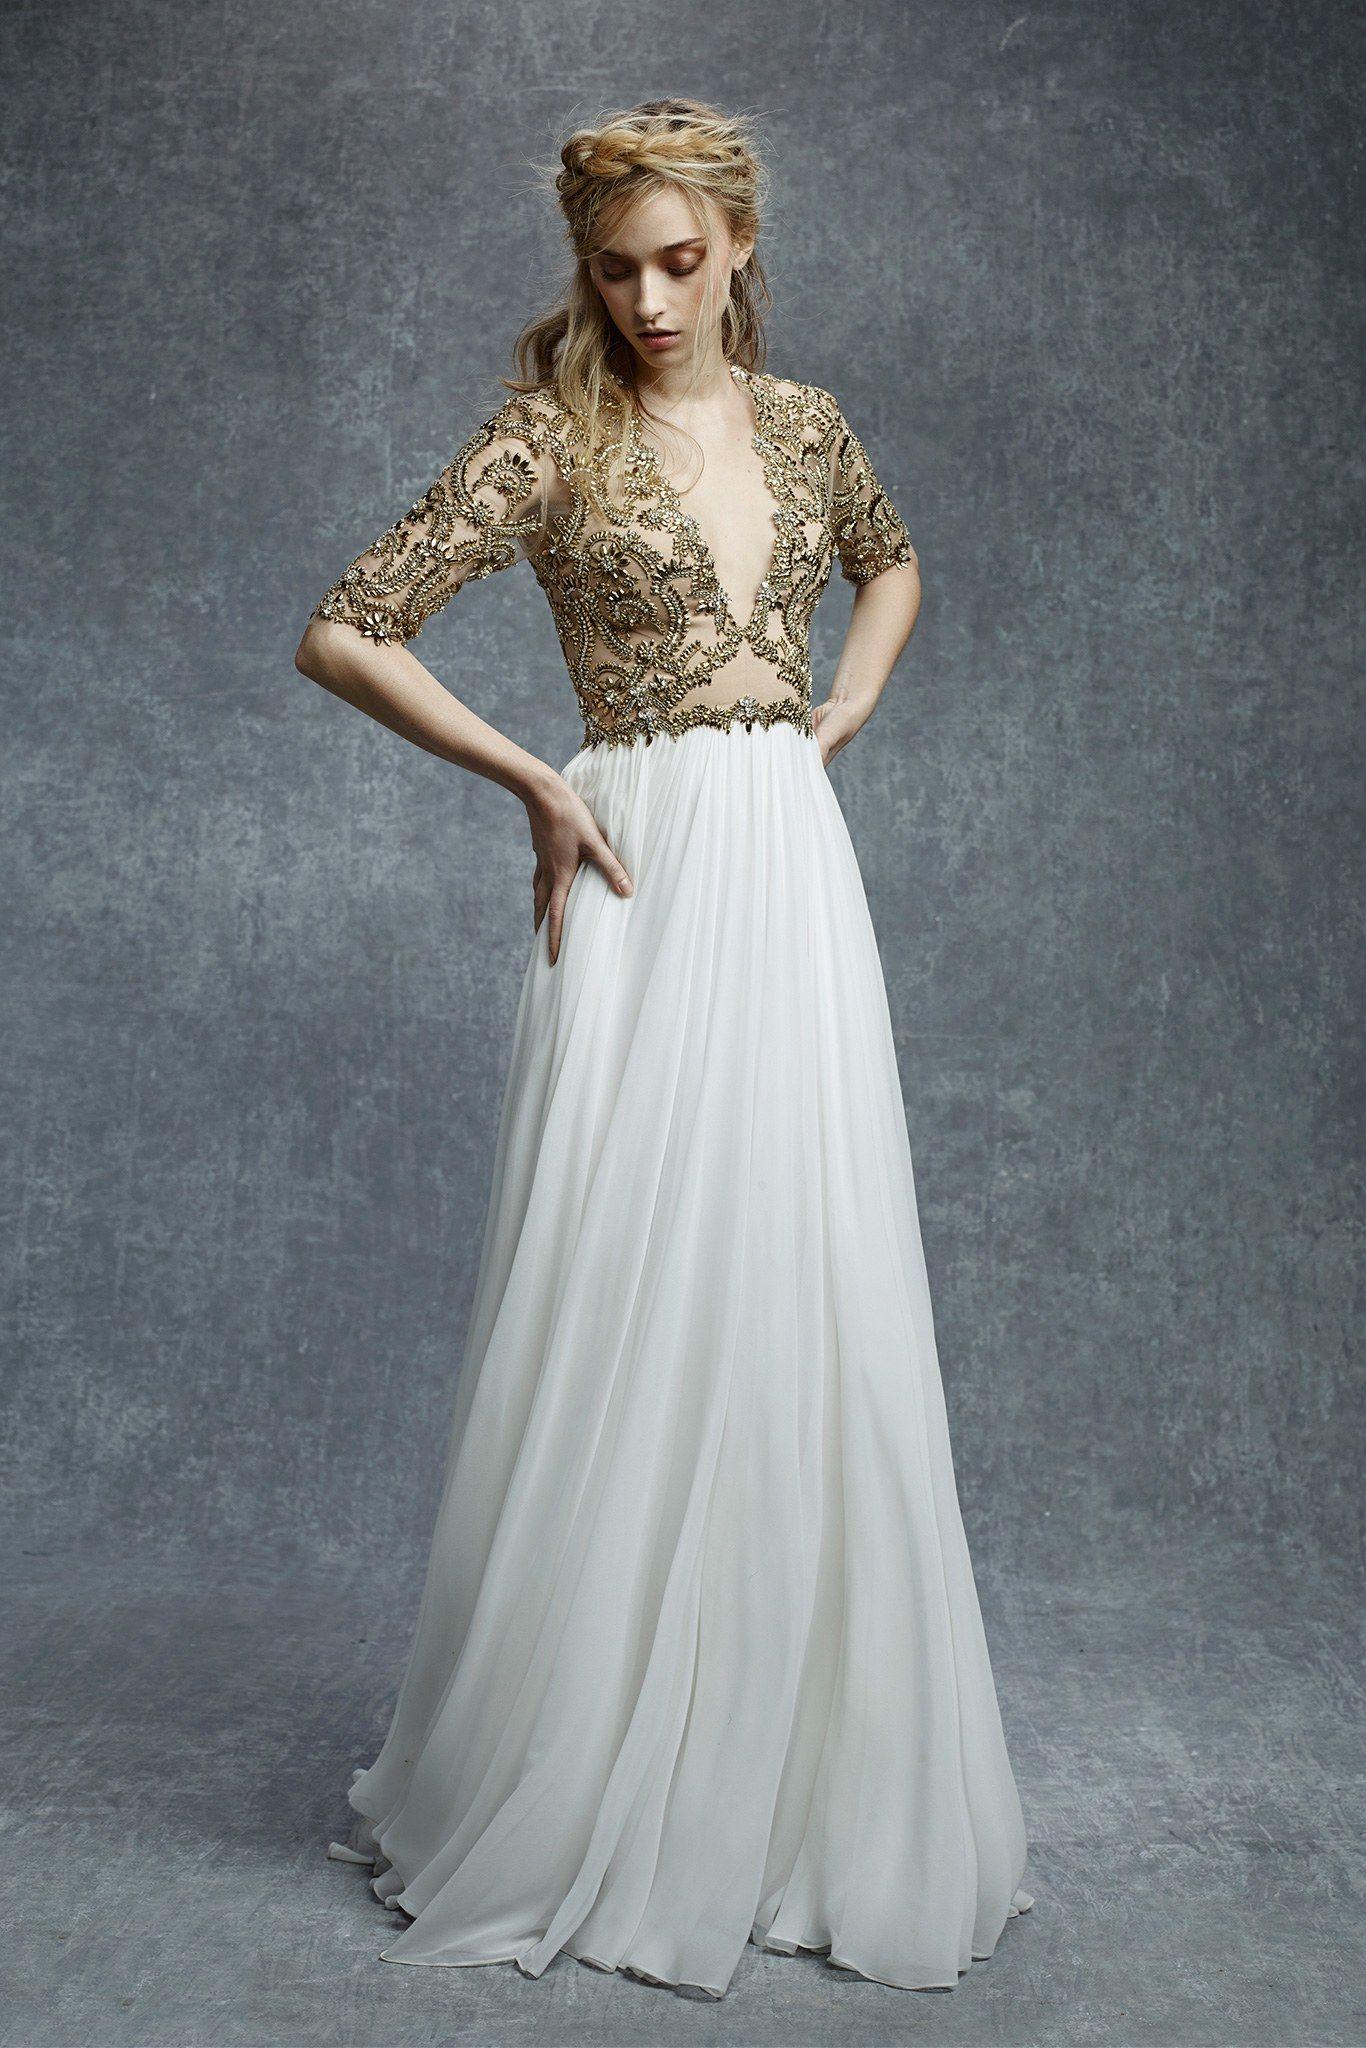 Reem acra prefall fashion show beautiful beautiful dresses